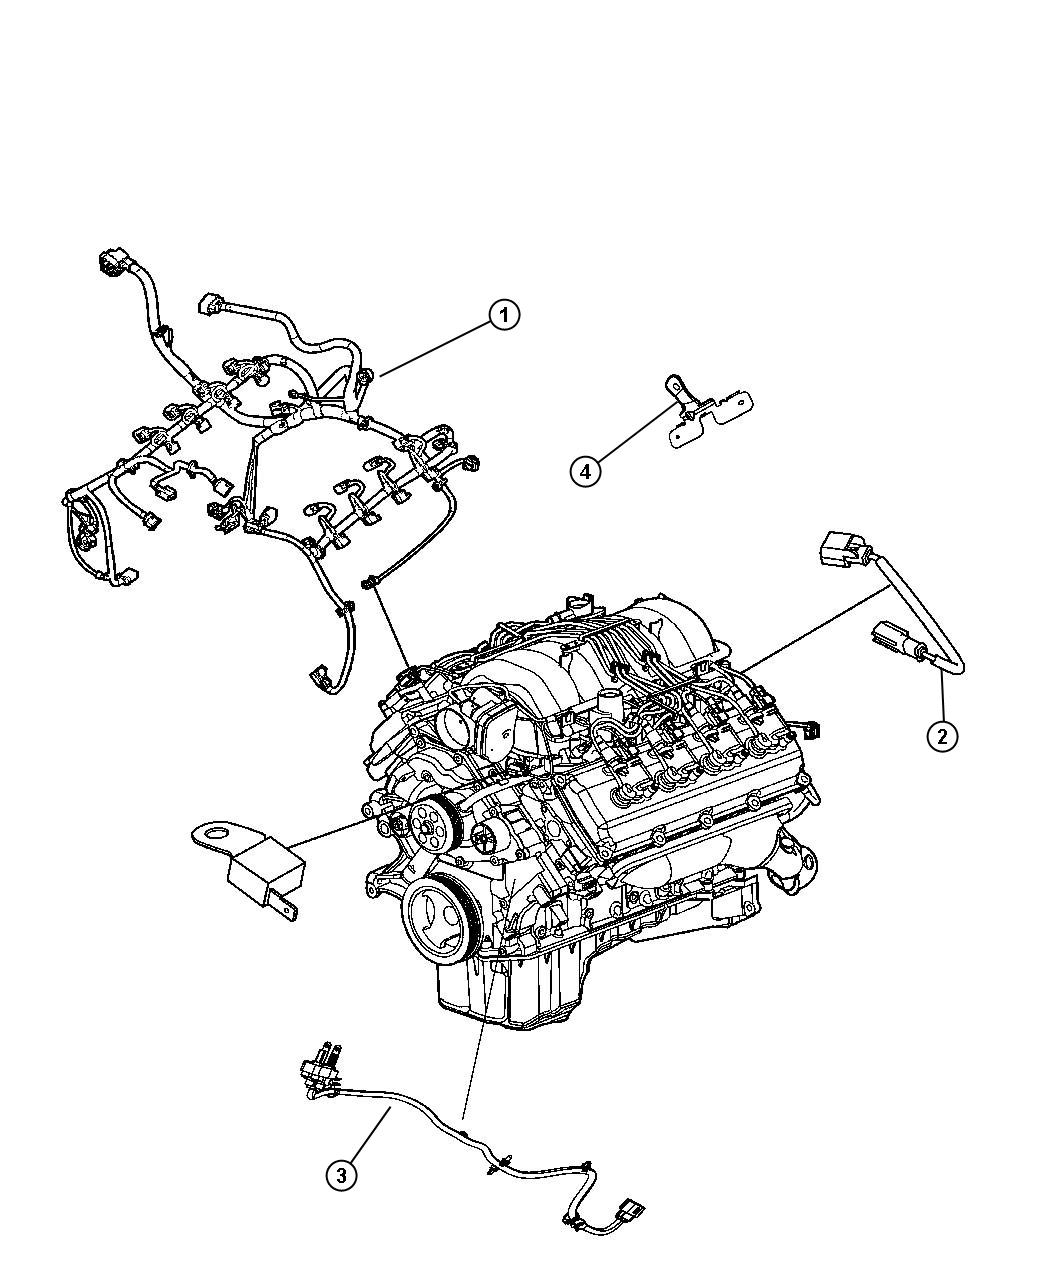 Dodge Ram 1500 Wiring. Engine. [elec shift on demand